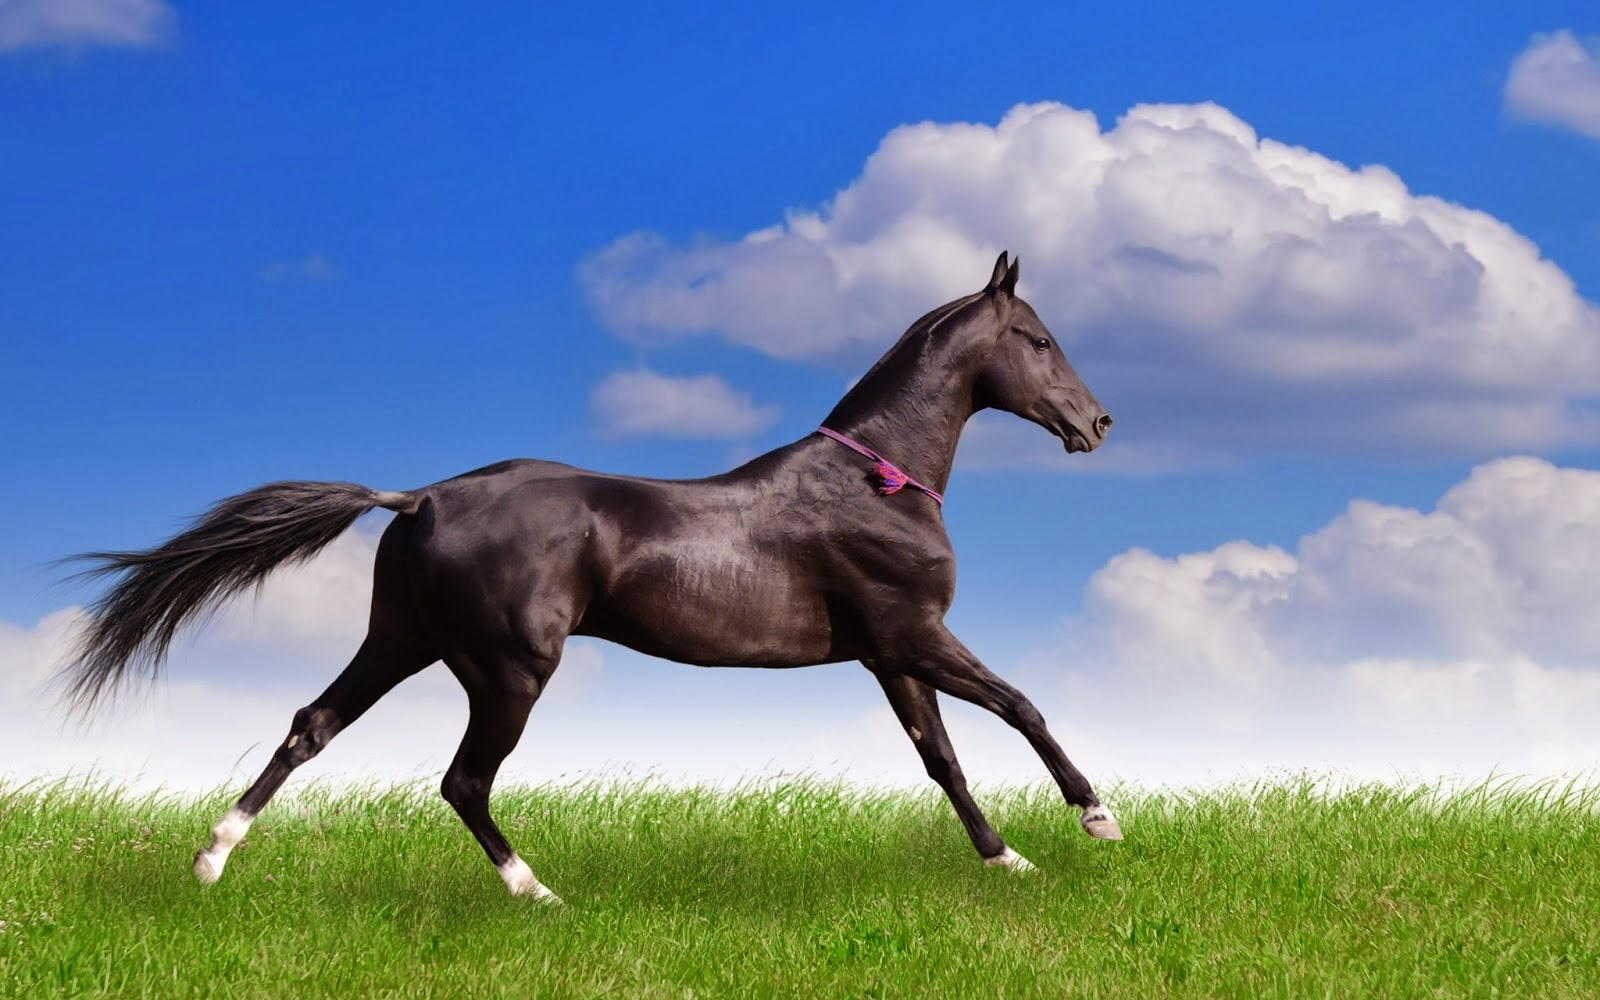 Must see   Wallpaper Horse Pinterest - Black+Horse+hd+Wallpapers+2013_1  2018_883946.jpg